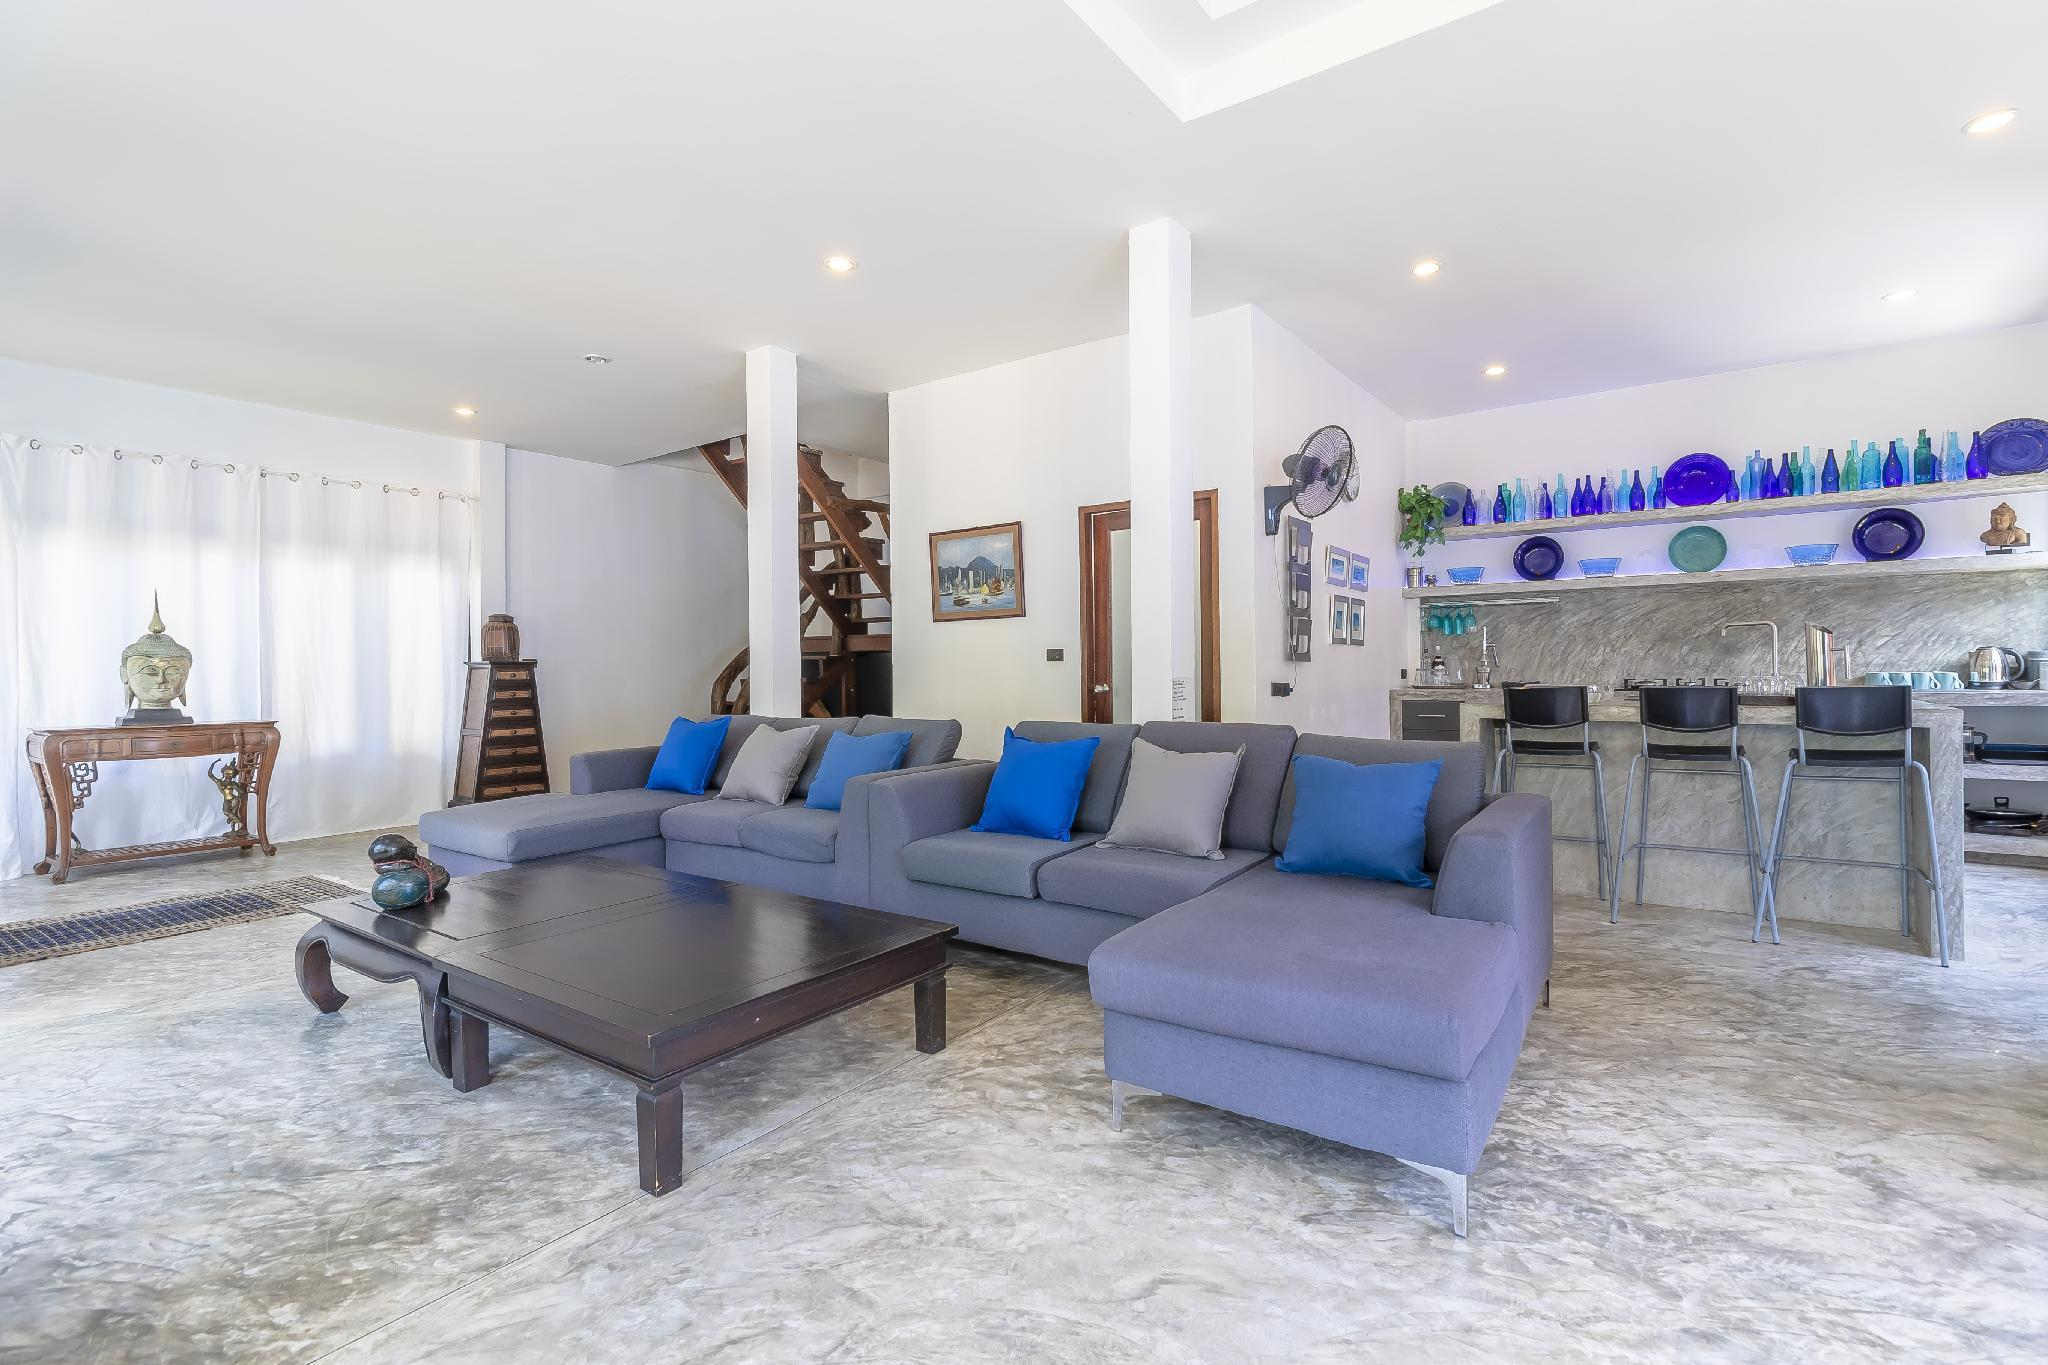 Spacious 4 bed villa in perfect location วิลลา 3 ห้องนอน 2 ห้องน้ำส่วนตัว ขนาด 300 ตร.ม. – ไทรรี